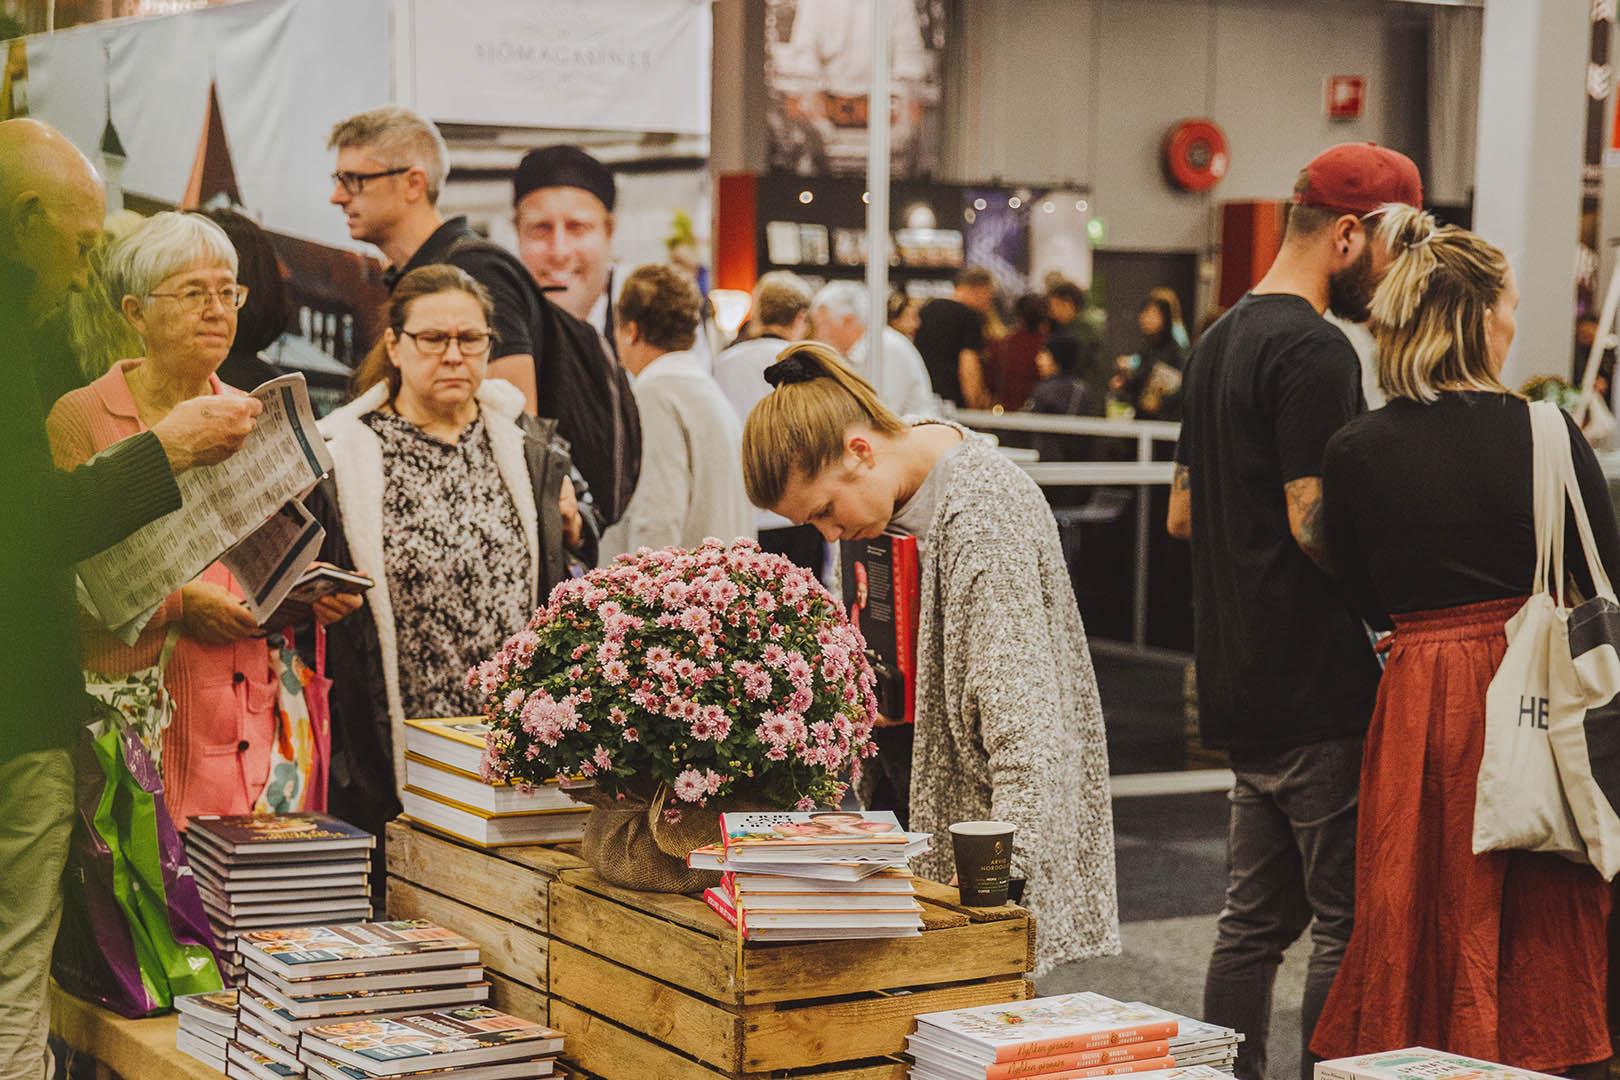 Göteborg Book Fair, stories that change the world, photo by Natalie Greppi